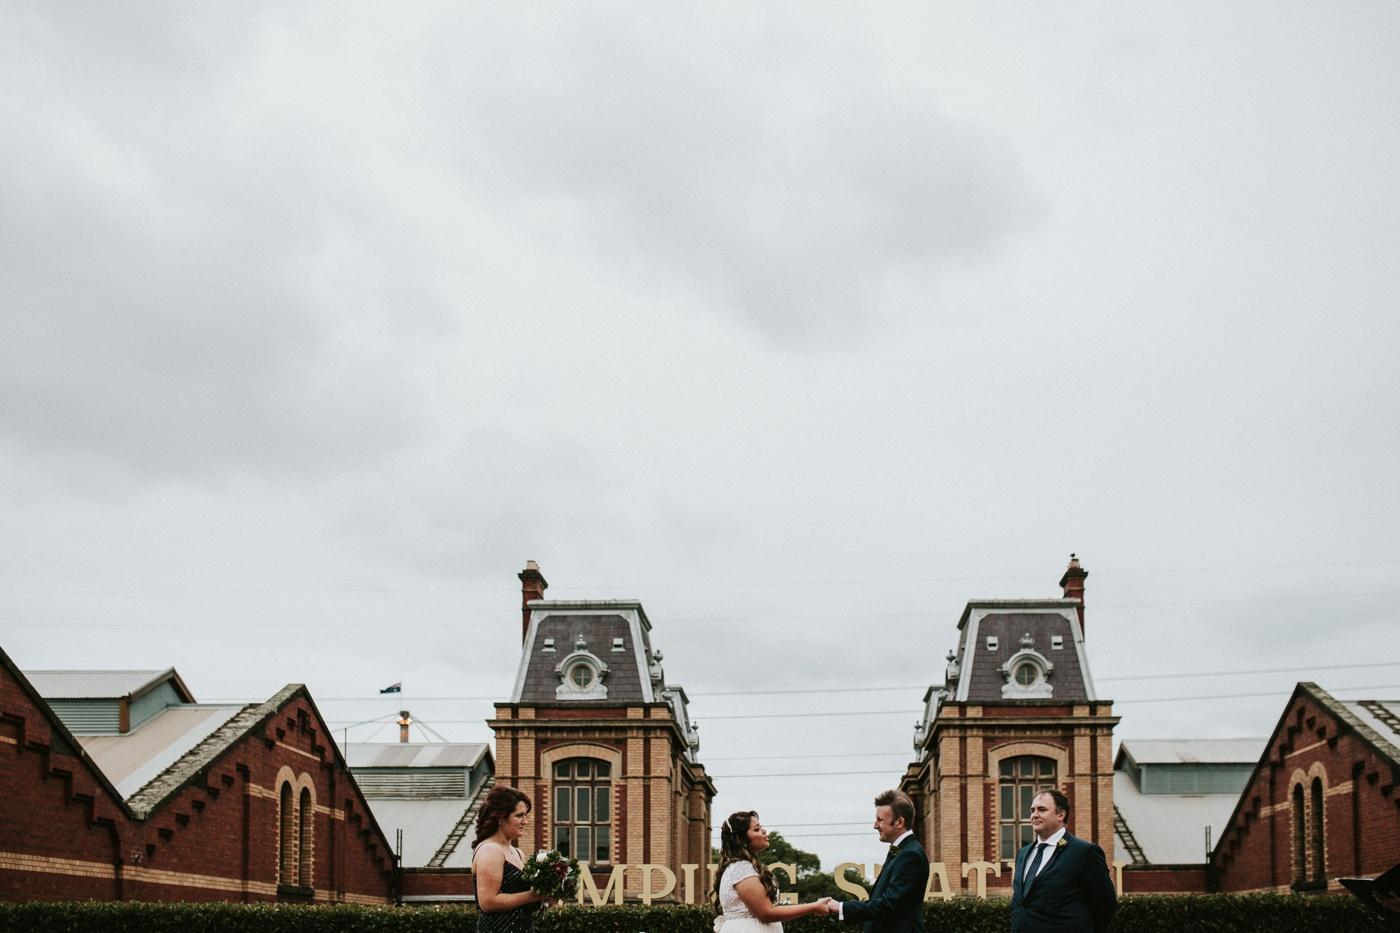 anitadaniel_melbourne-scienceworks-relaxed-fun-geek-wedding_melbourne-candid-wedding-photography_47